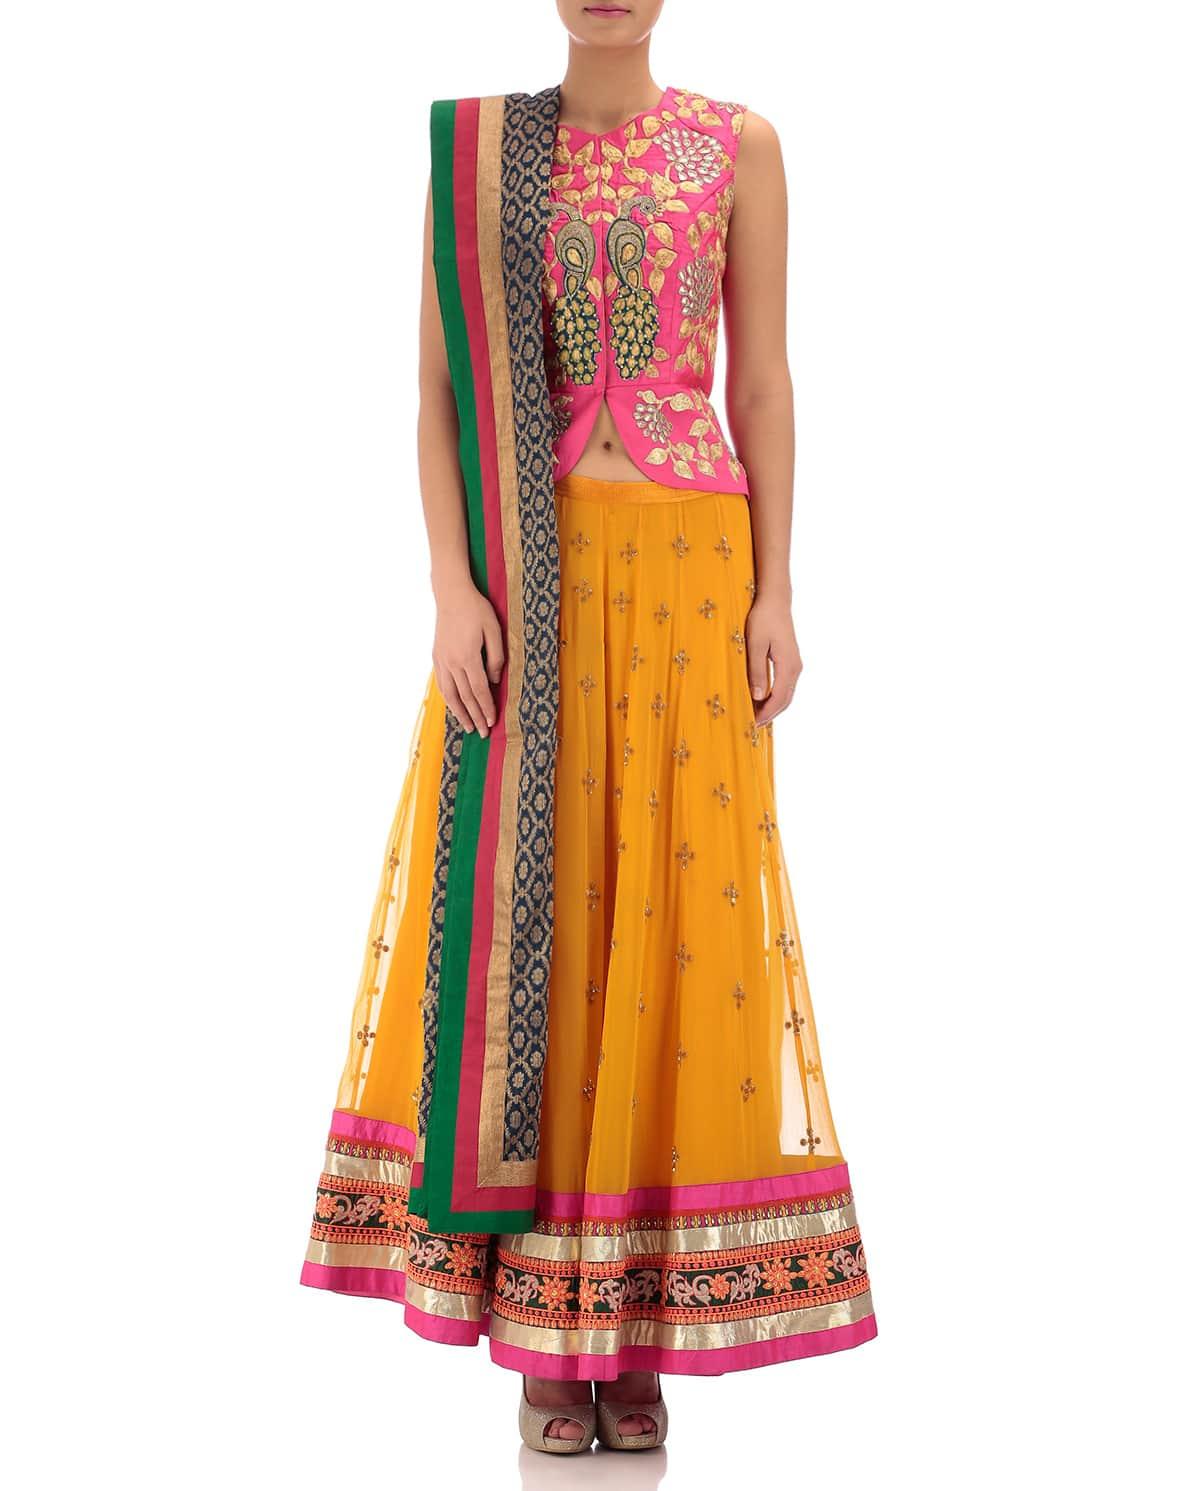 Colourful Embroidered Lehenga Set